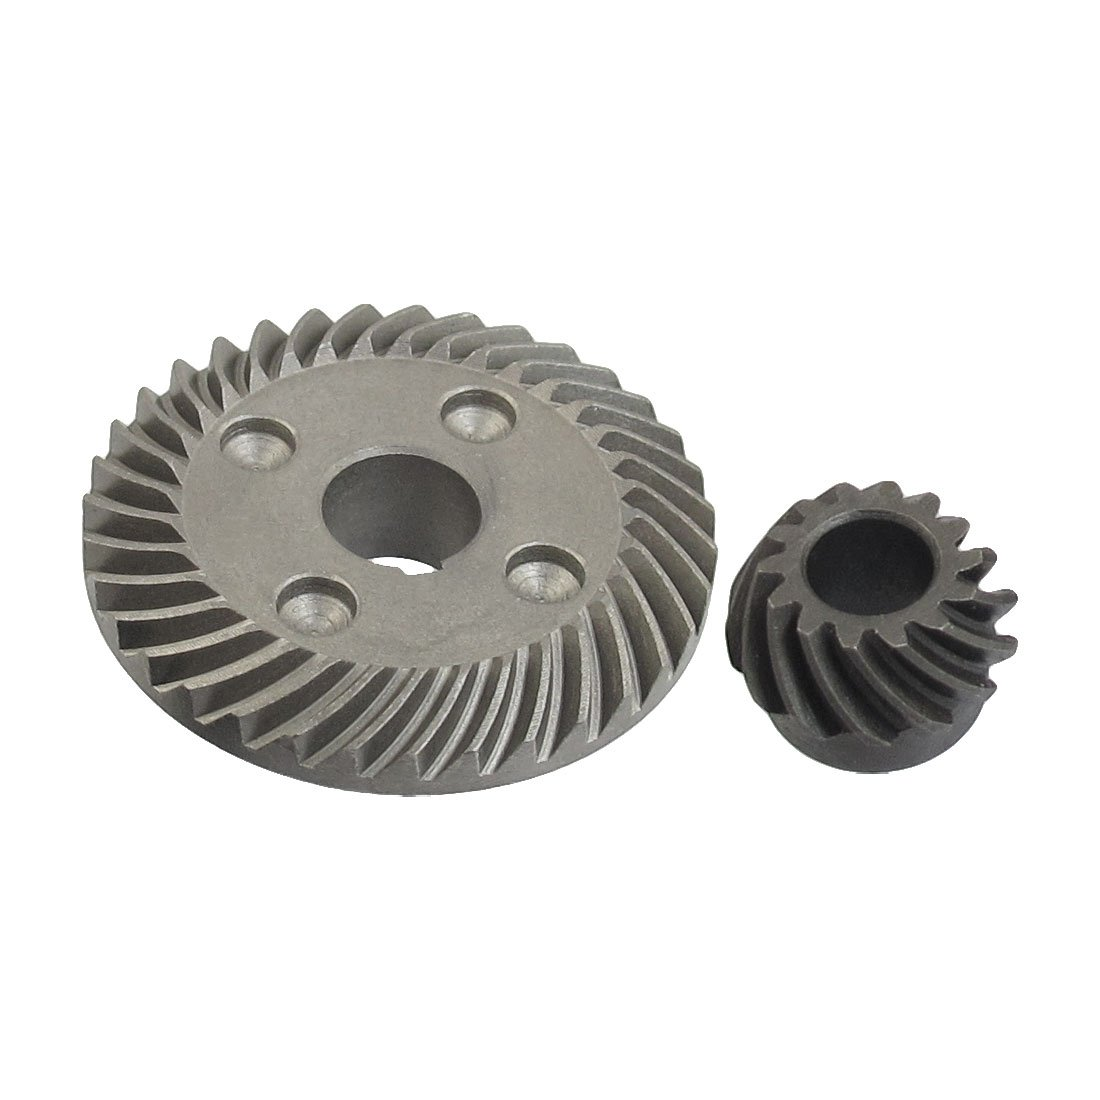 Bevel gear made of steel module 3 20 teeth i=2:1 milled